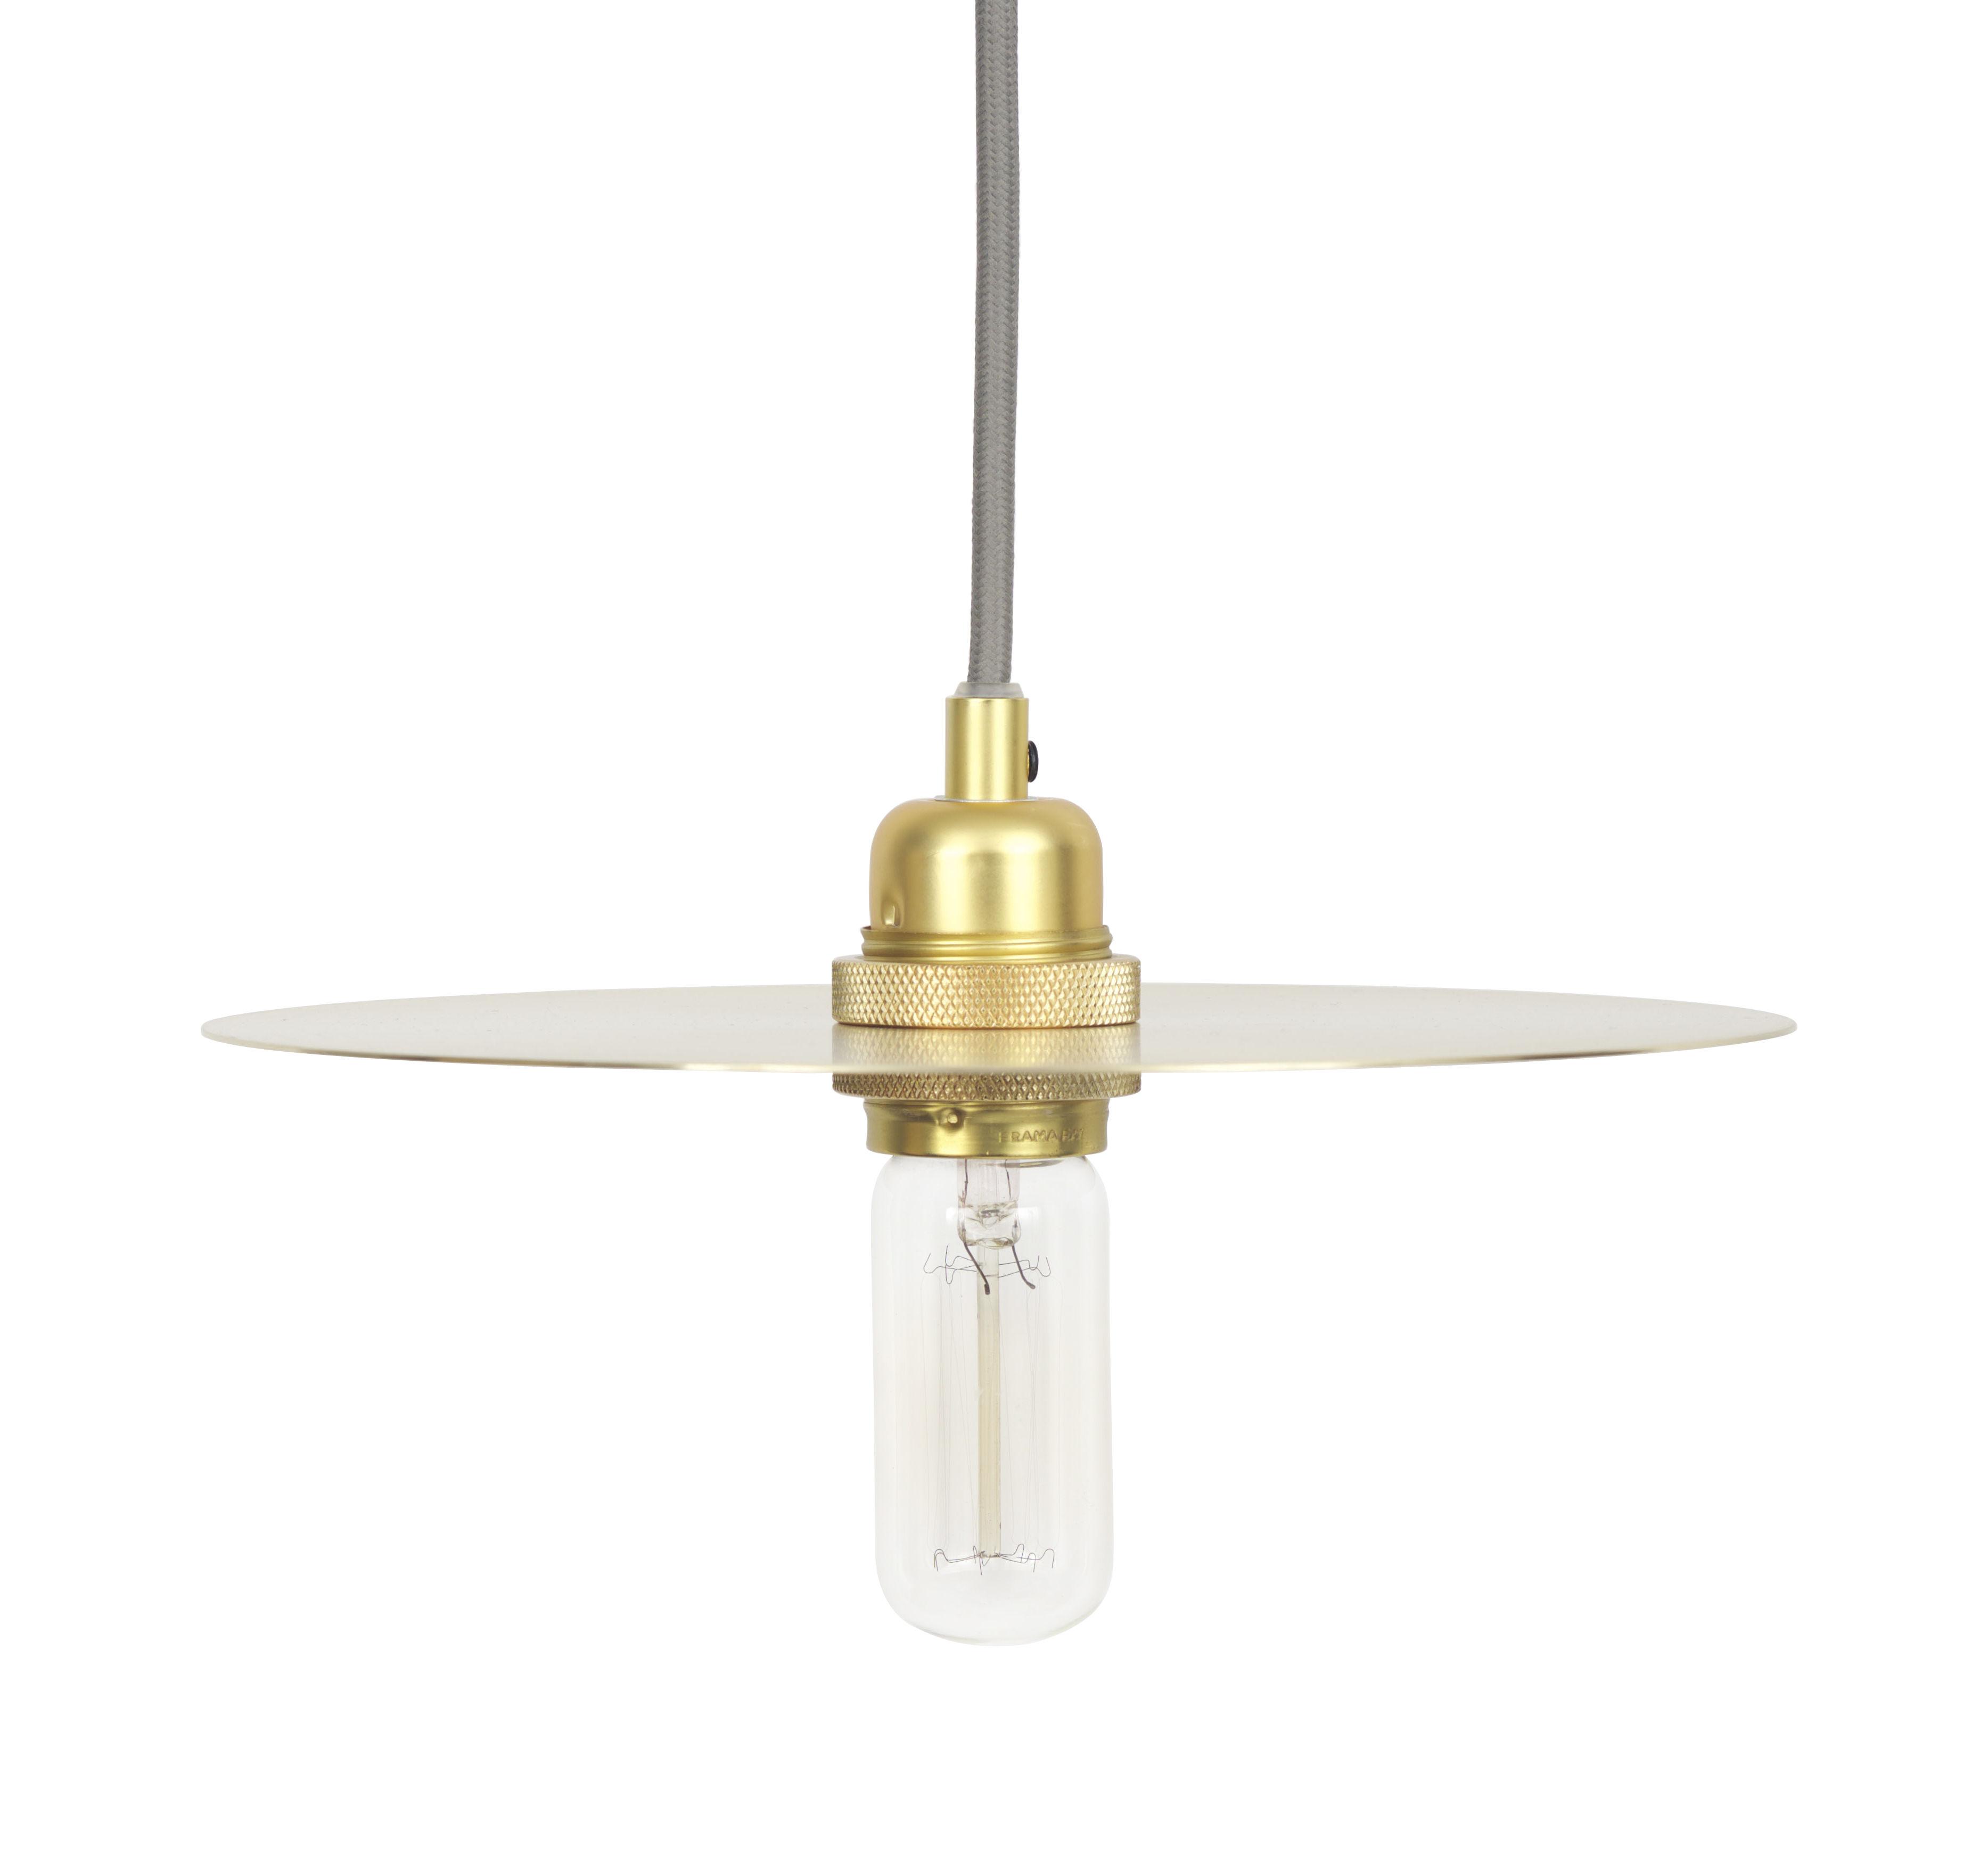 Leuchten - Pendelleuchten - Circle Medium Lampenschirm / Ø 25 cm - Frama  - Medium - Messing - Messing